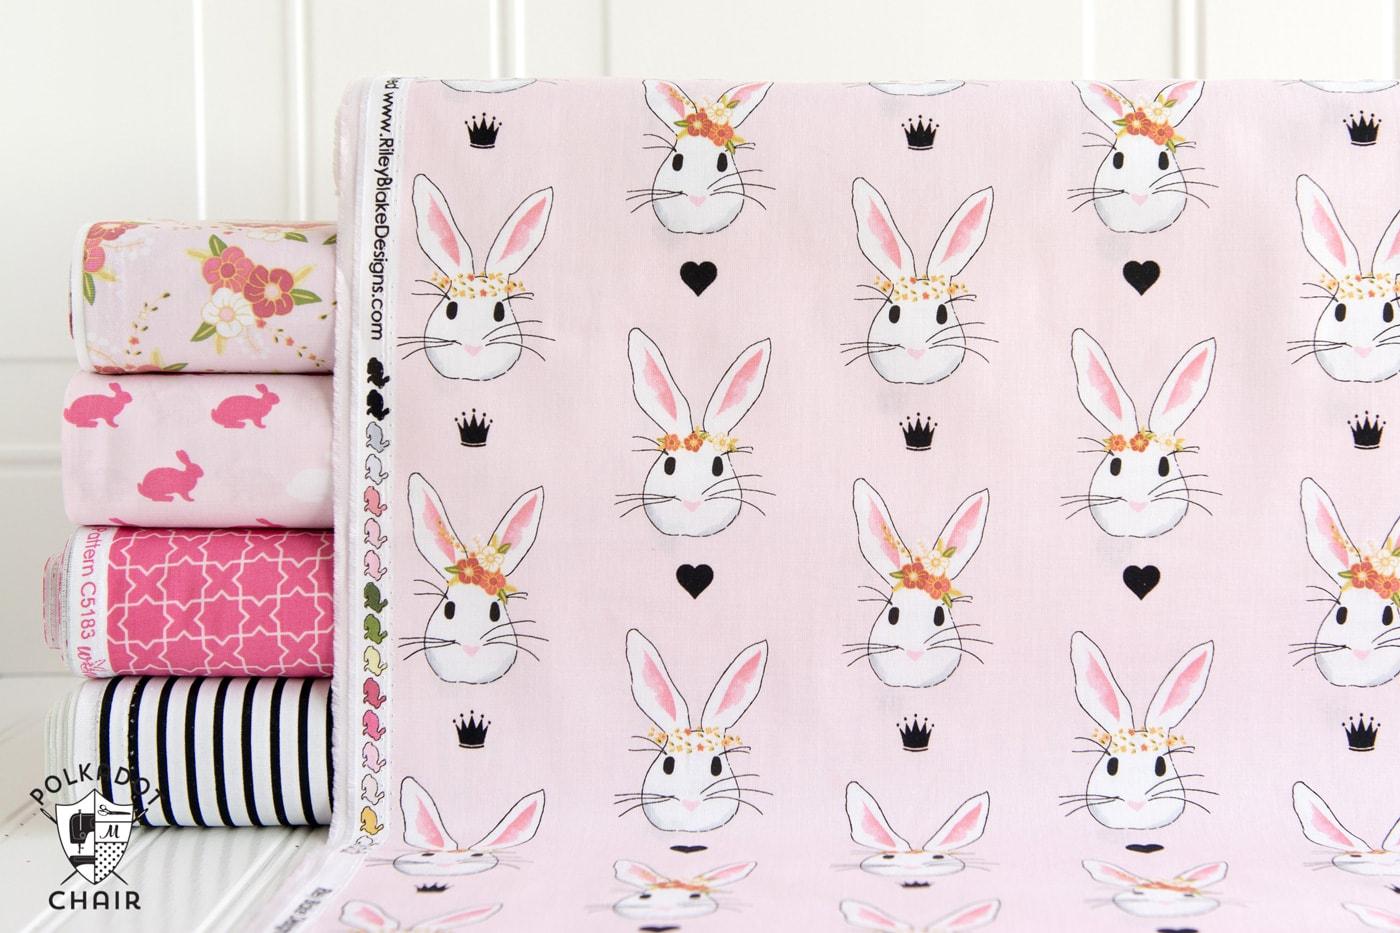 Wonderland Fabrics by Melissa Mortenson of polkadotchair.com for Riley Blake Designs